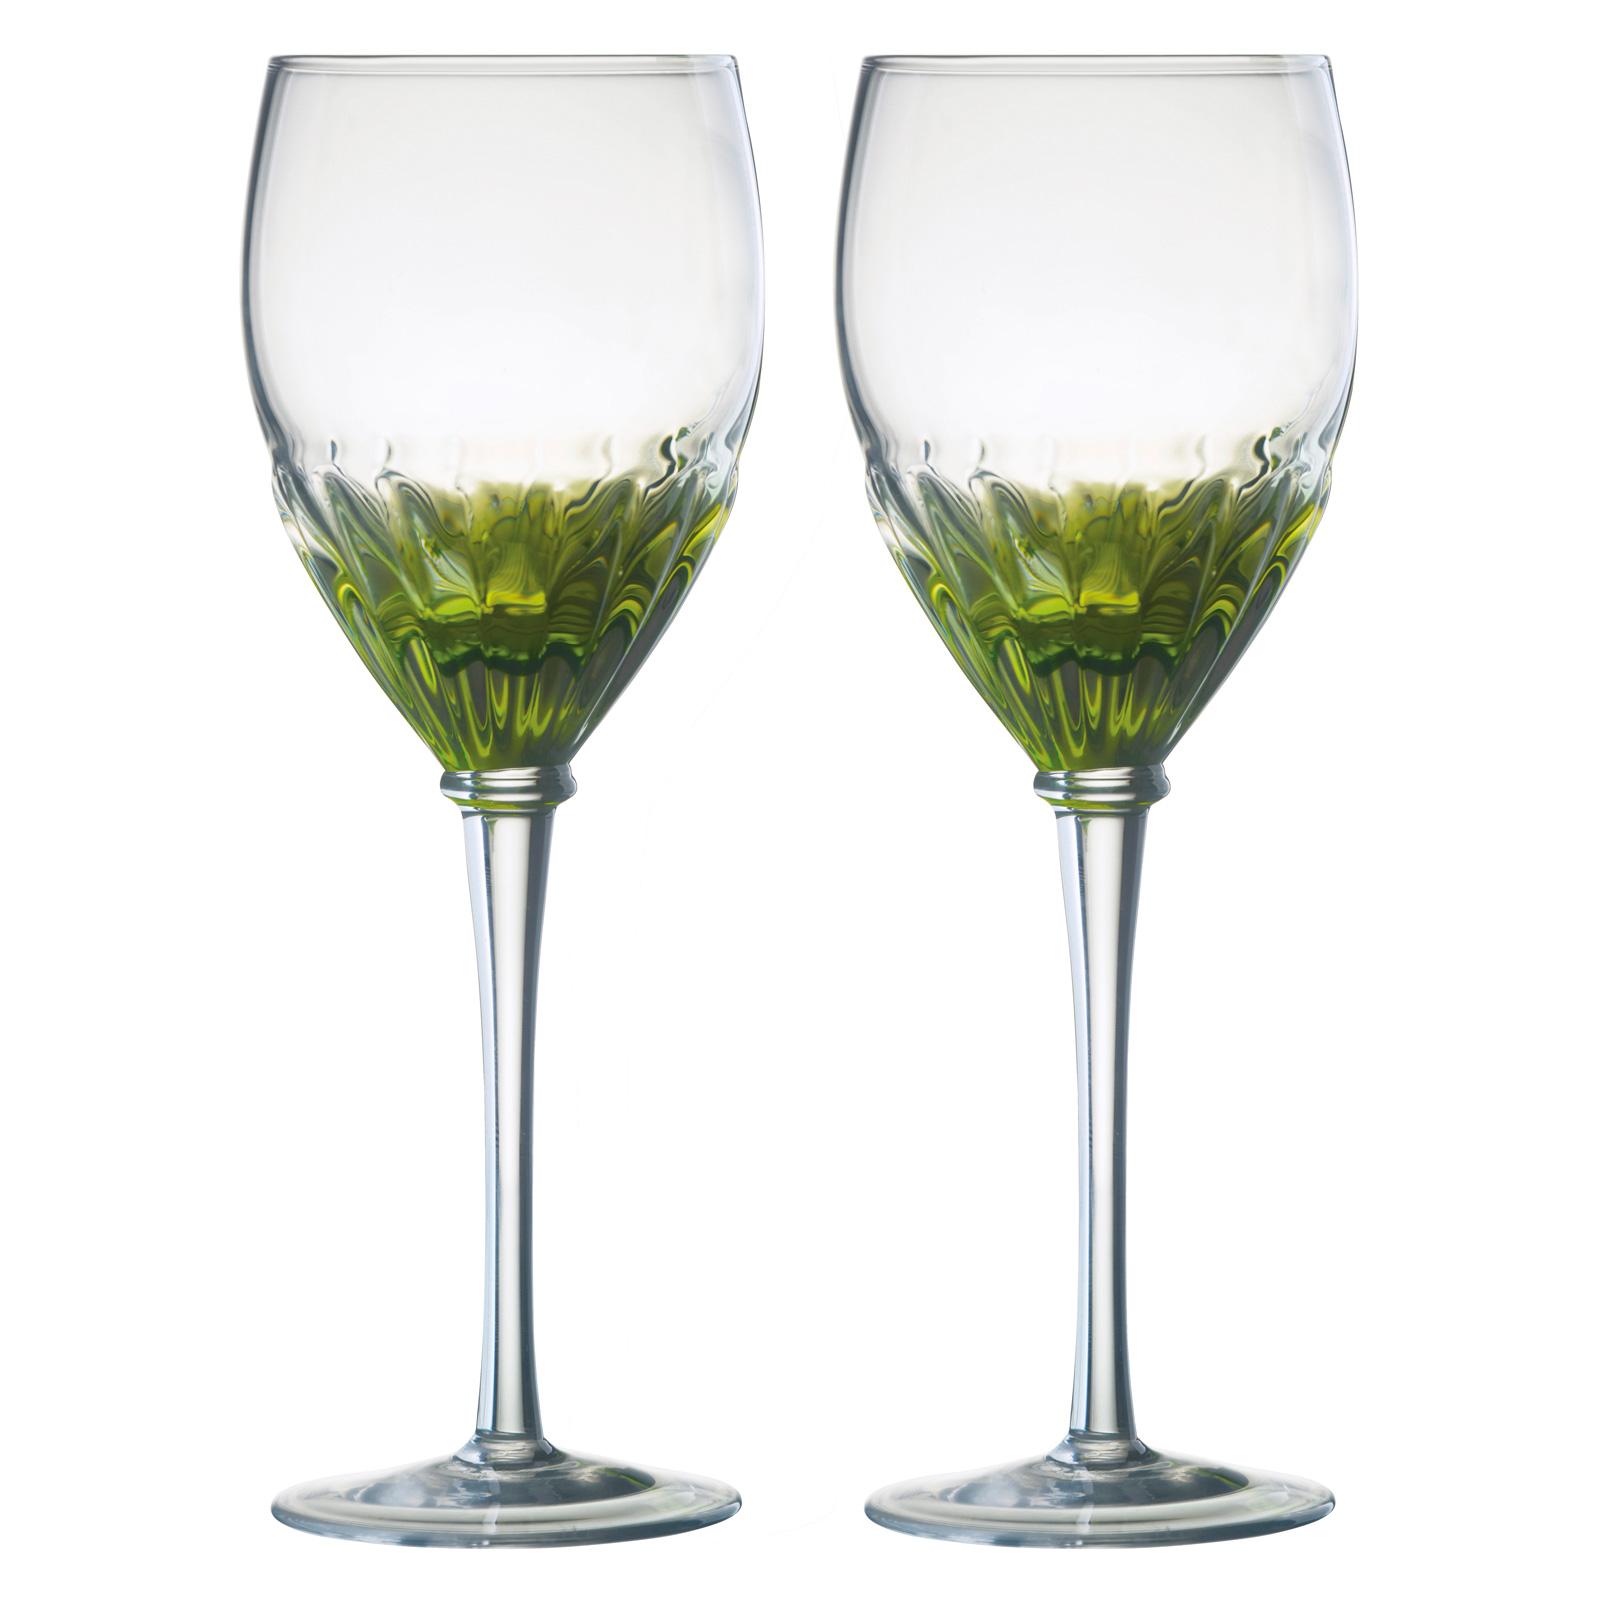 Set of 2 Solar Wine Glasses Green by Anton Studio Designs